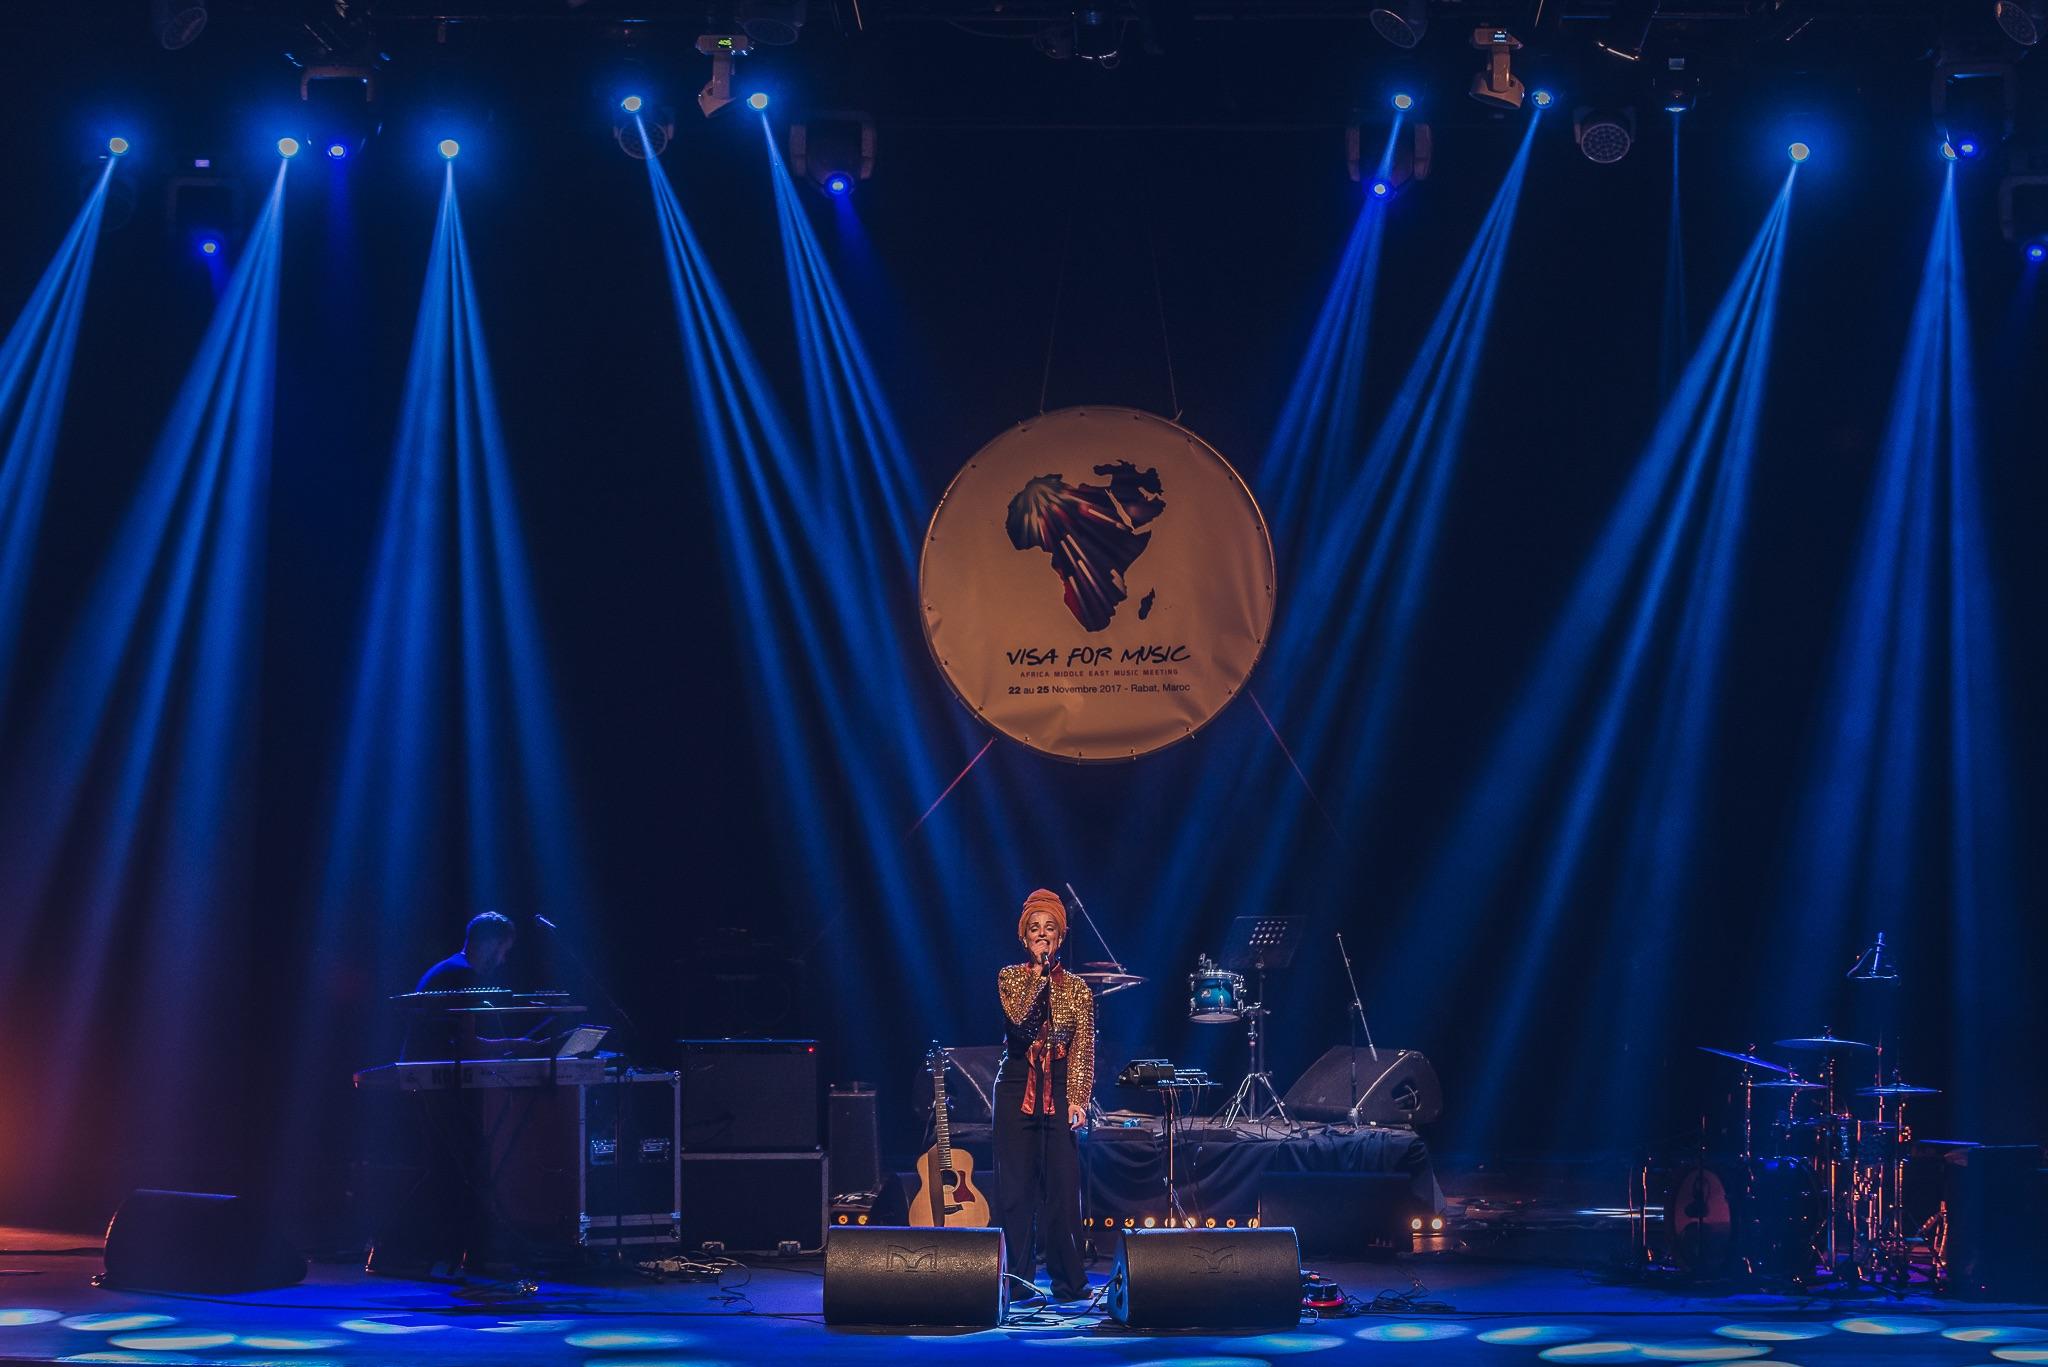 visa_for_music_23-11-2017_photo_radoslaw_kazmierczak-61.jpg